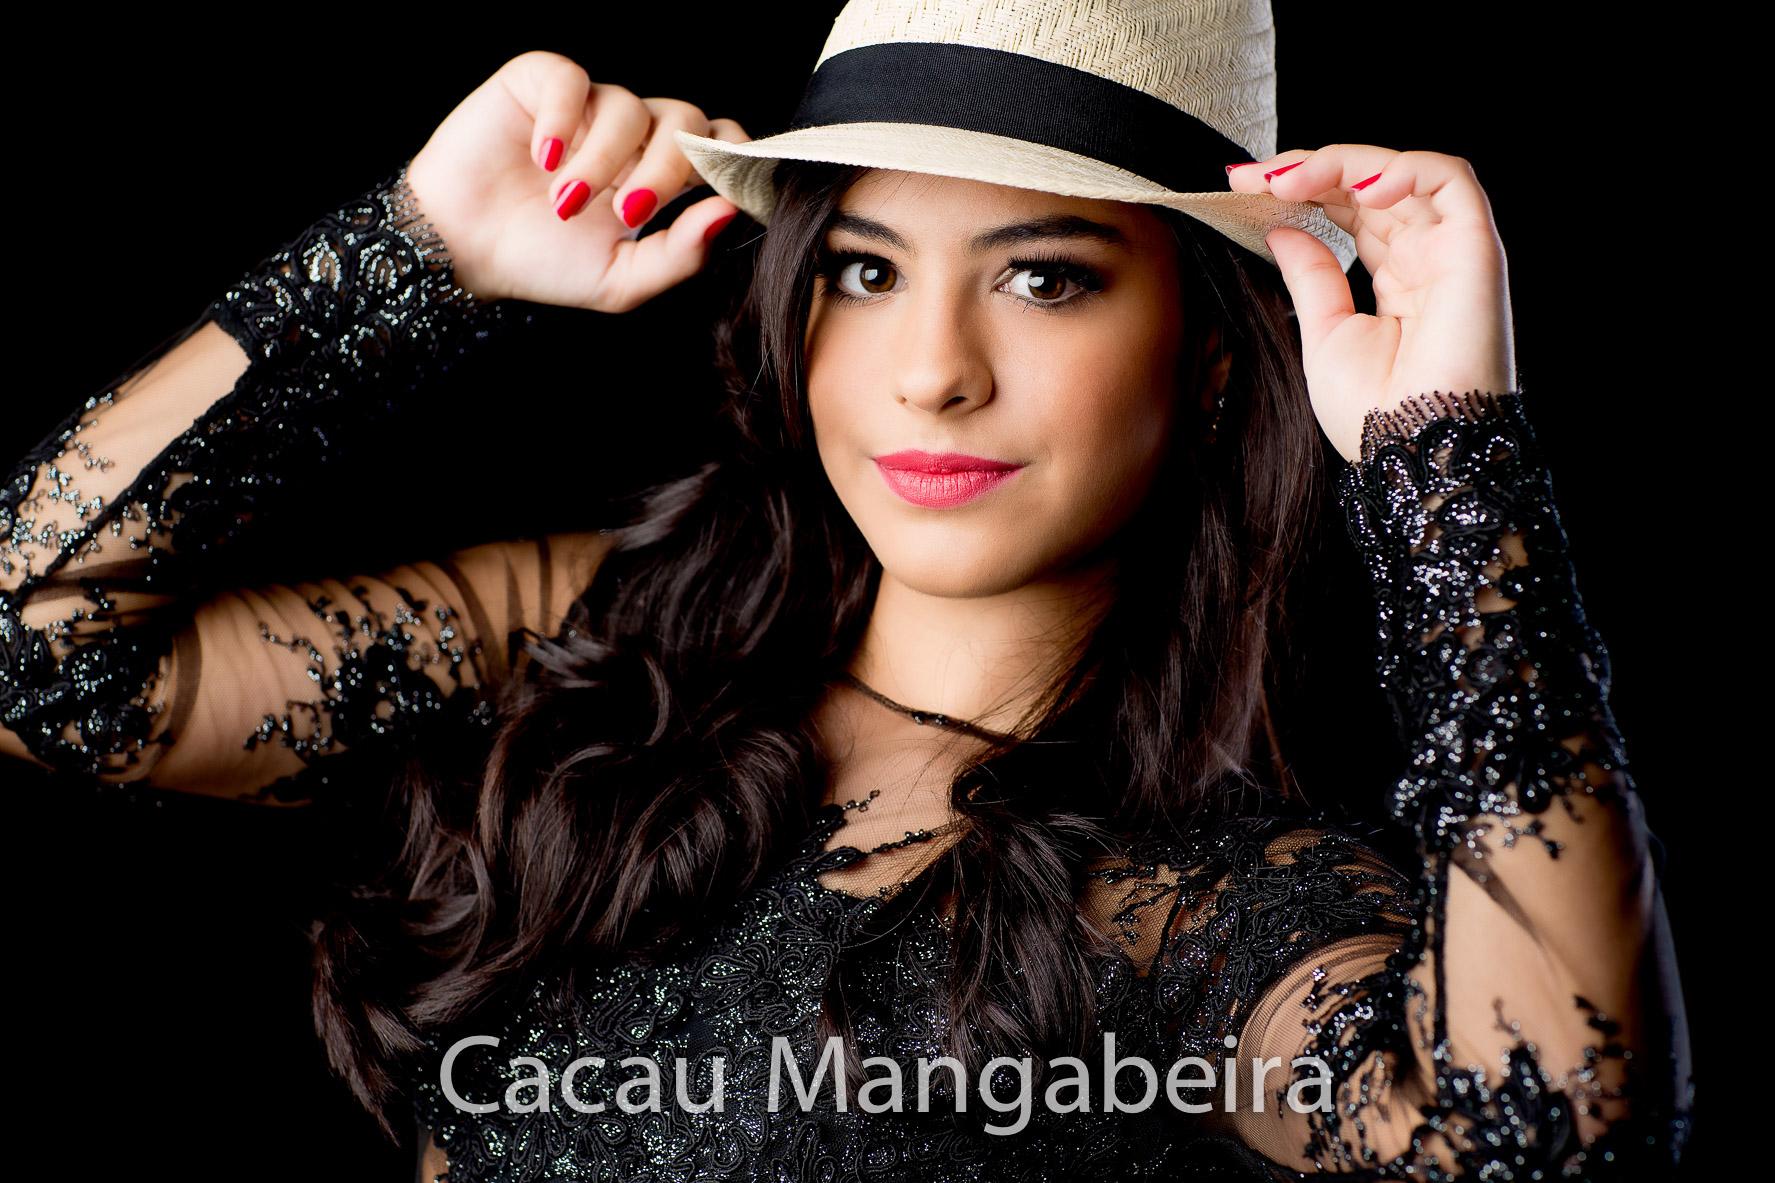 Beatriz-Cacaumangabeira